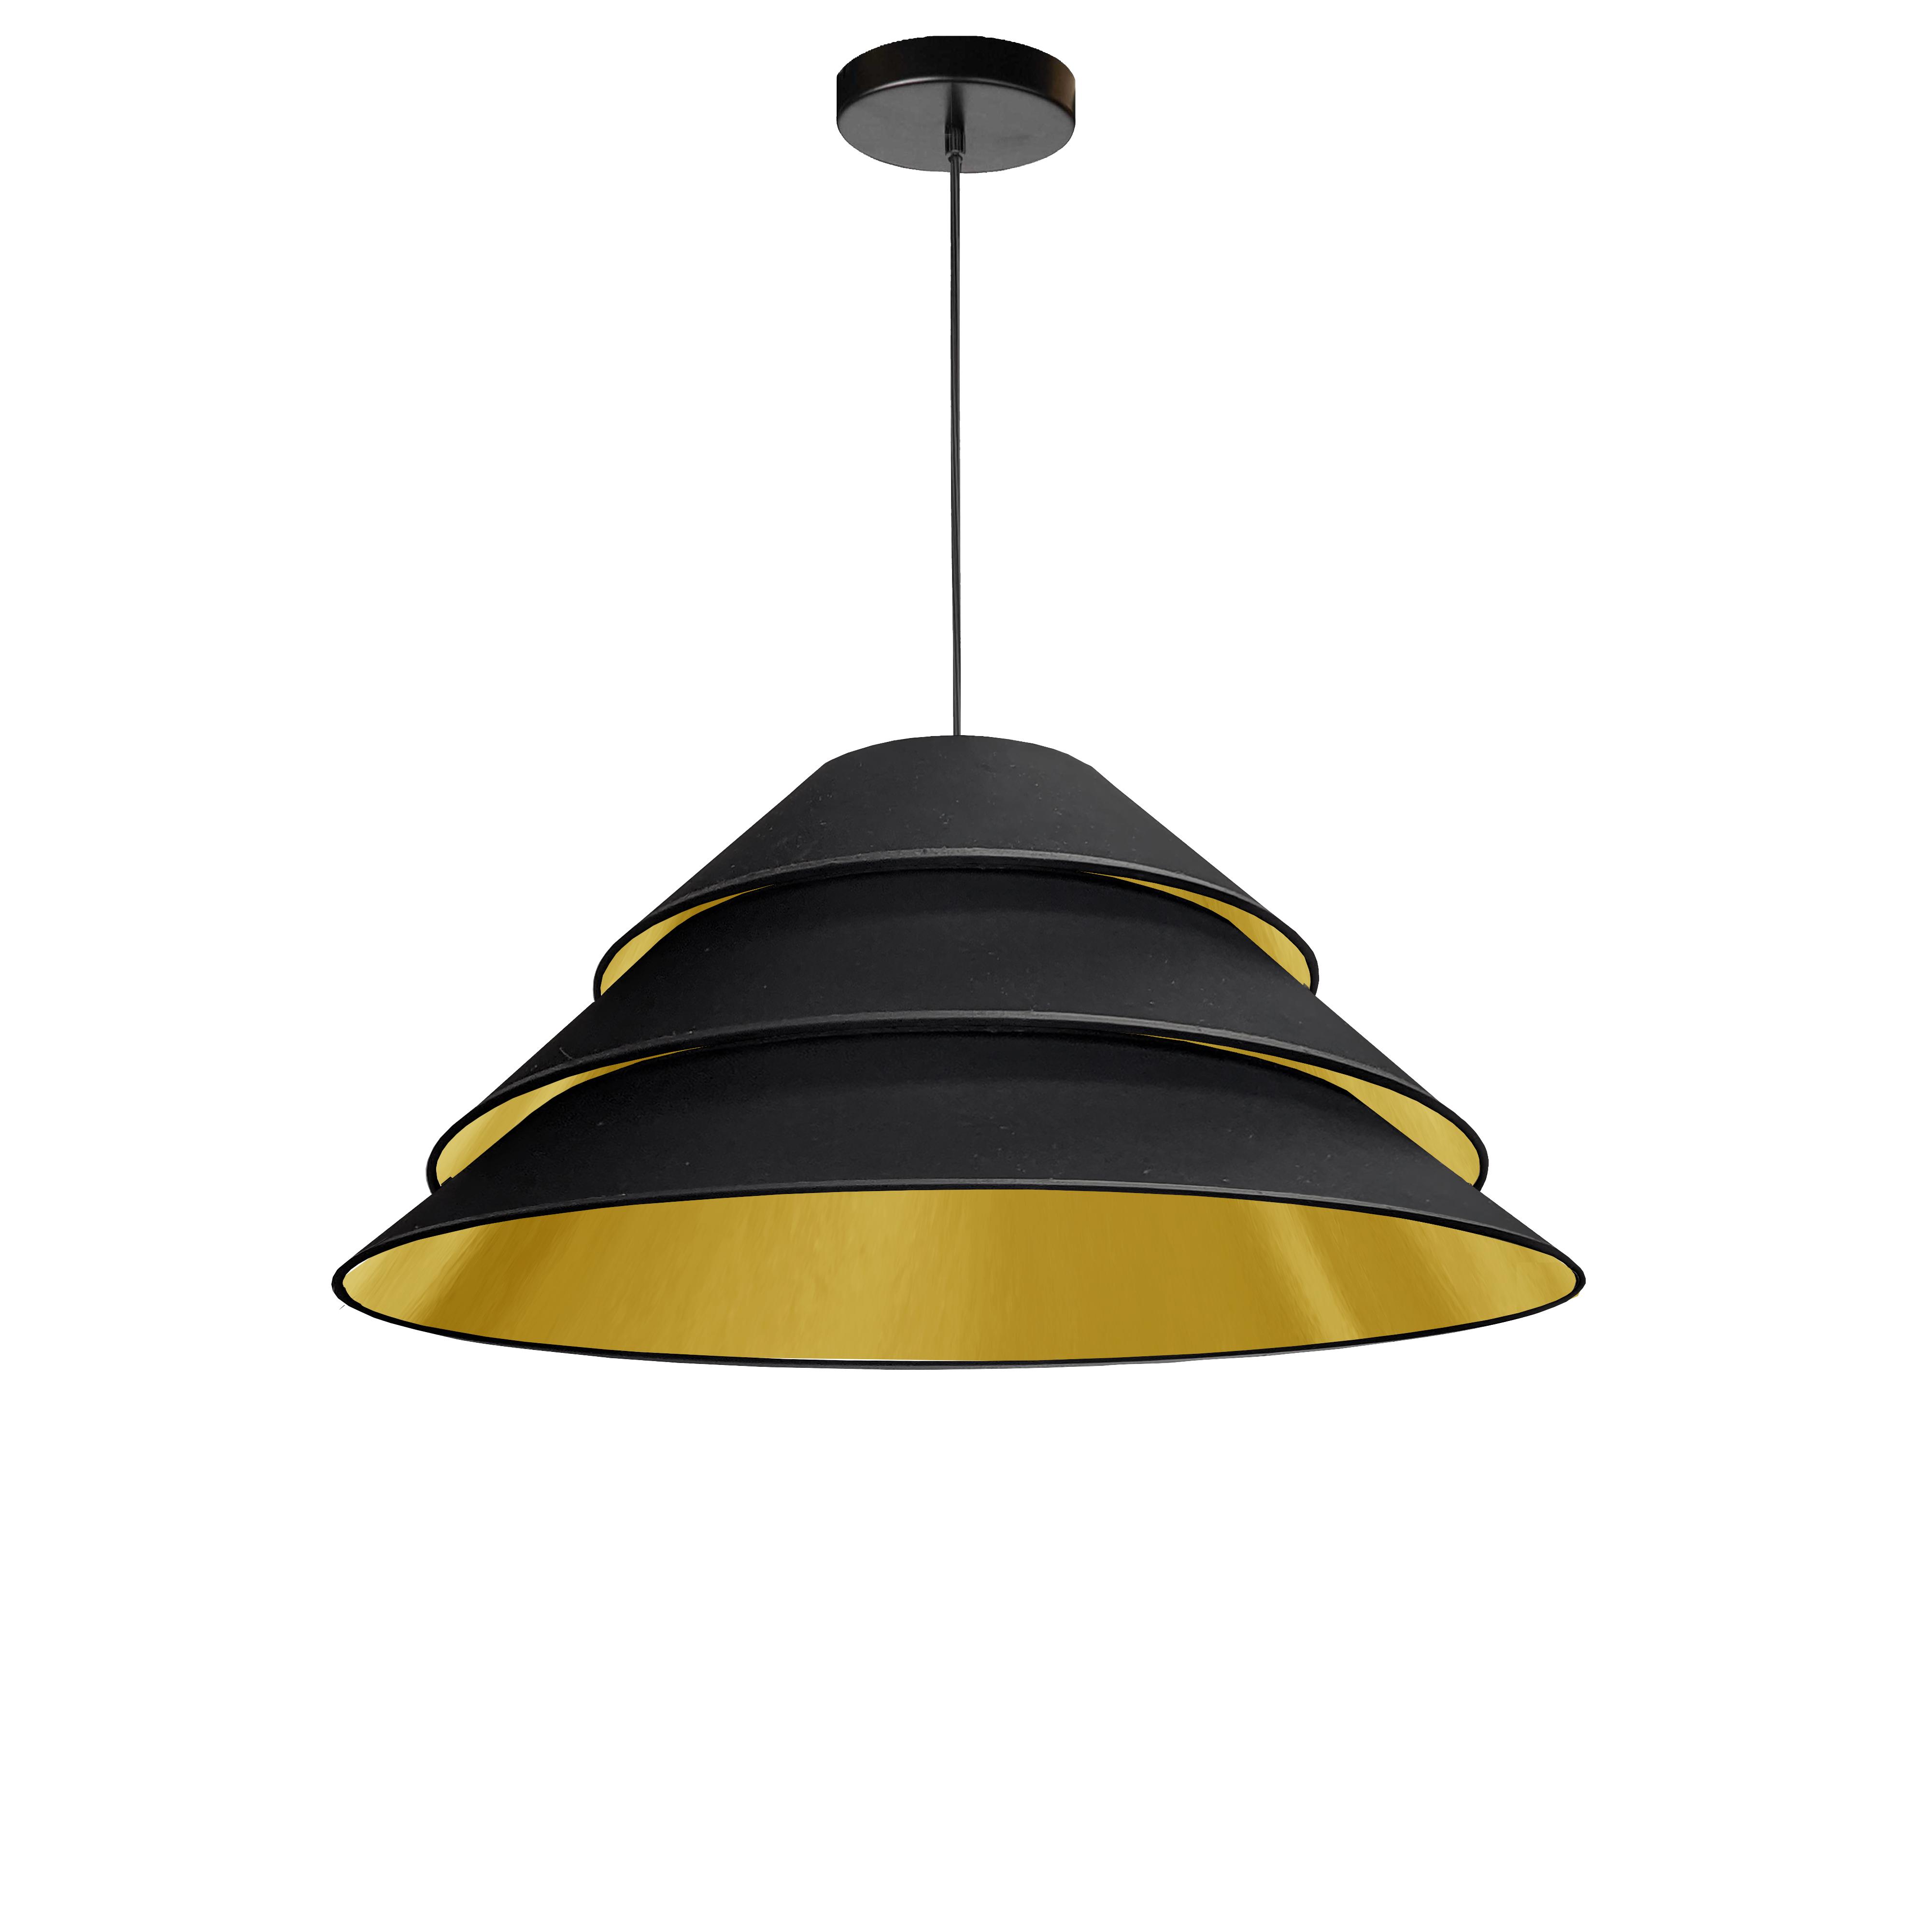 1Light Aranza Pendant, Black/Gold Shade, Black